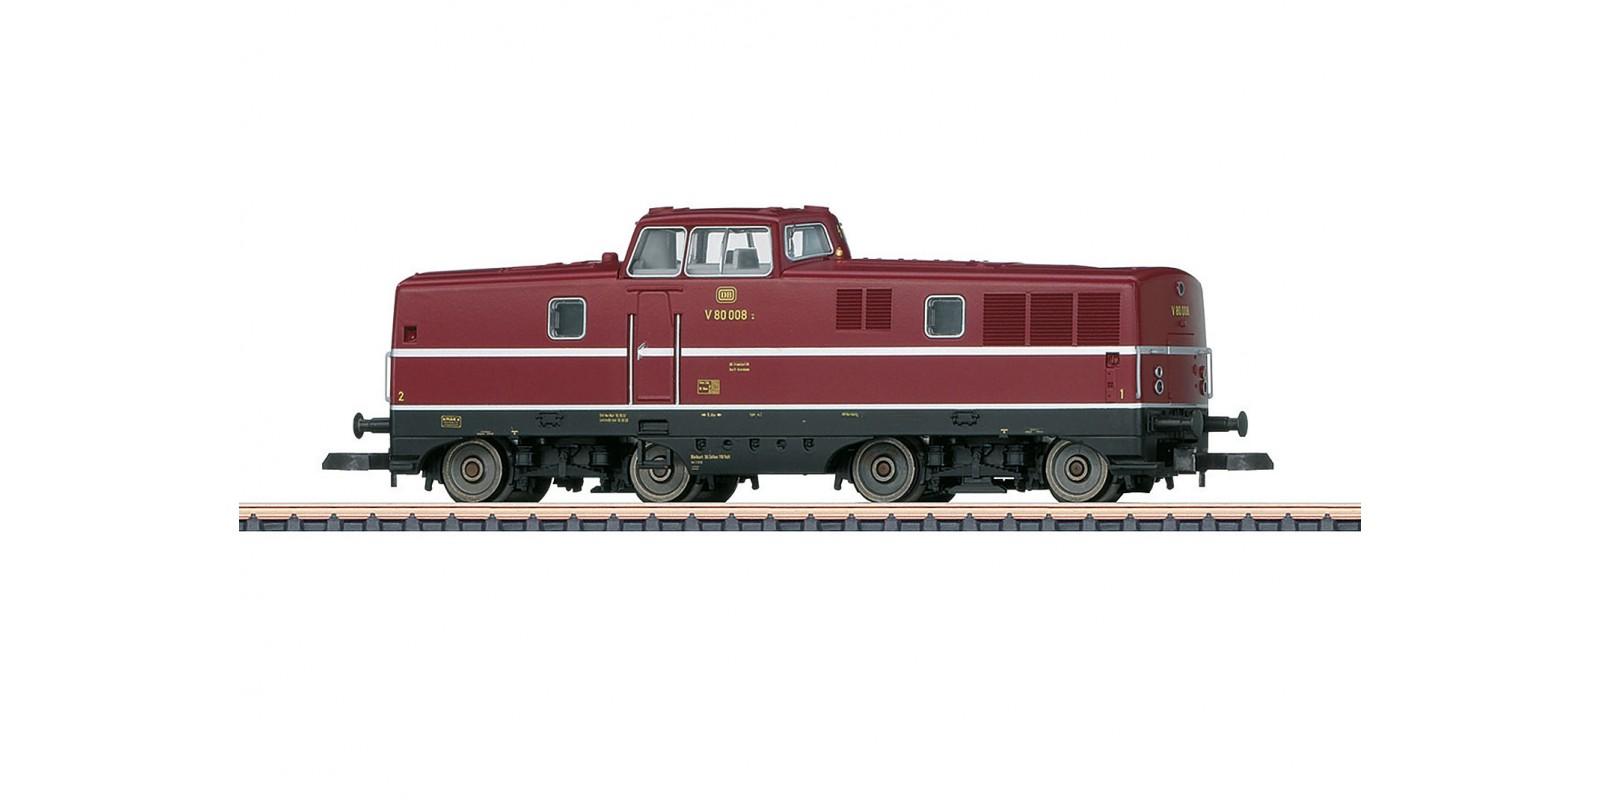 88803 Era III DB Class V 80 Diesel Hydraulic General-Purpose Locomotive